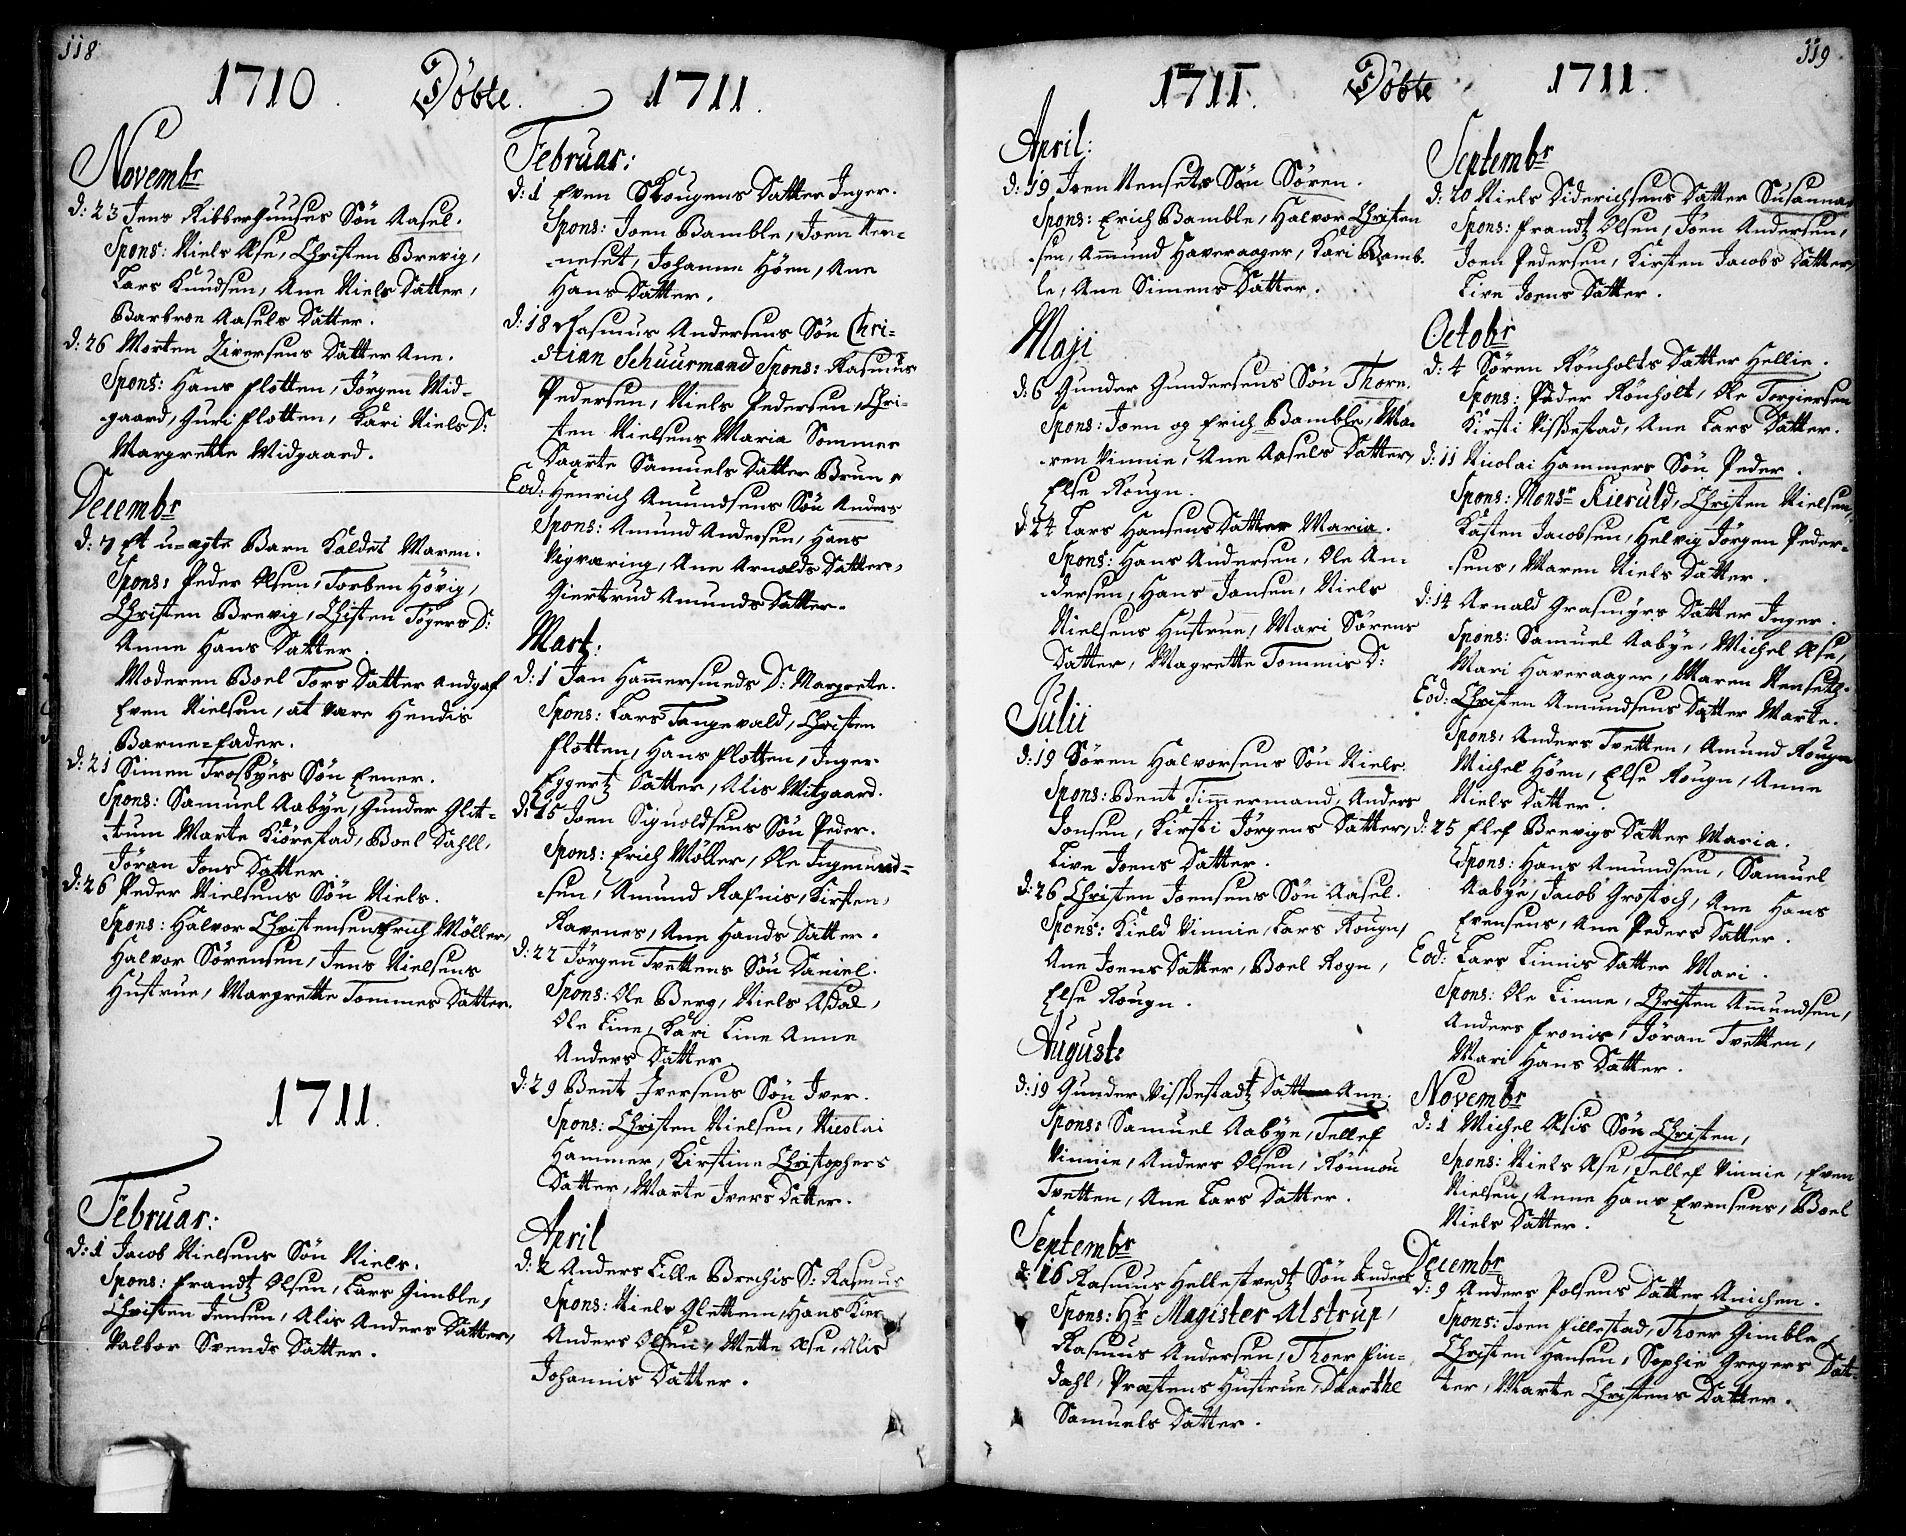 SAKO, Bamble kirkebøker, F/Fa/L0001: Ministerialbok nr. I 1, 1702-1774, s. 118-119